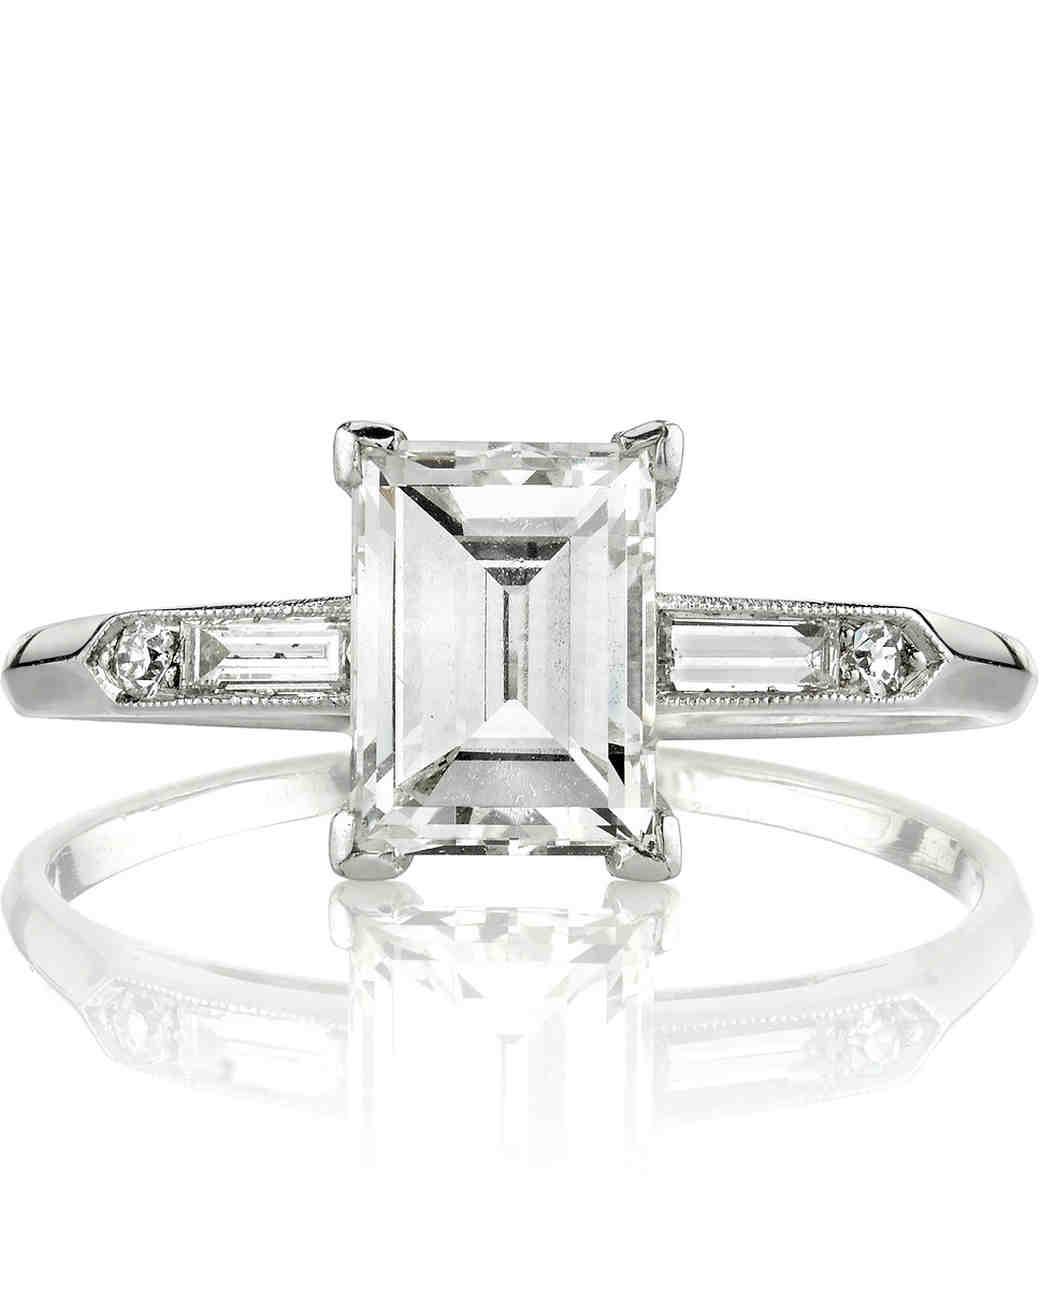 Single Stone vintage step-cut diamond engagement ring